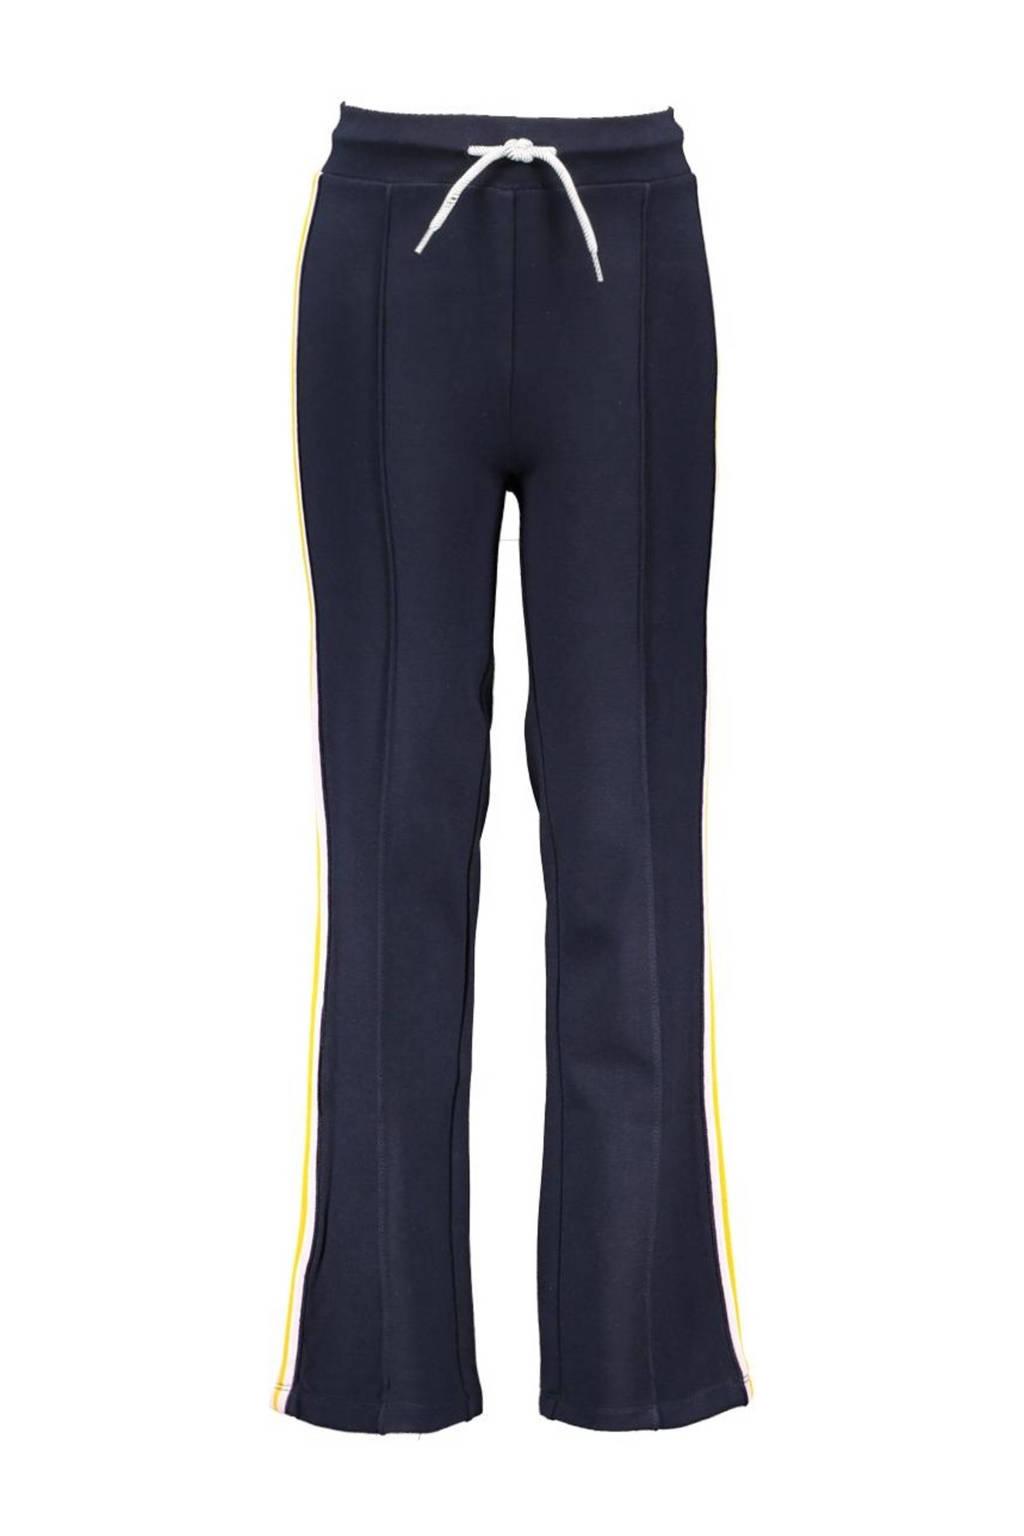 B.Nosy straight fit broek met zijstreep nachtblauw, Nachtblauw